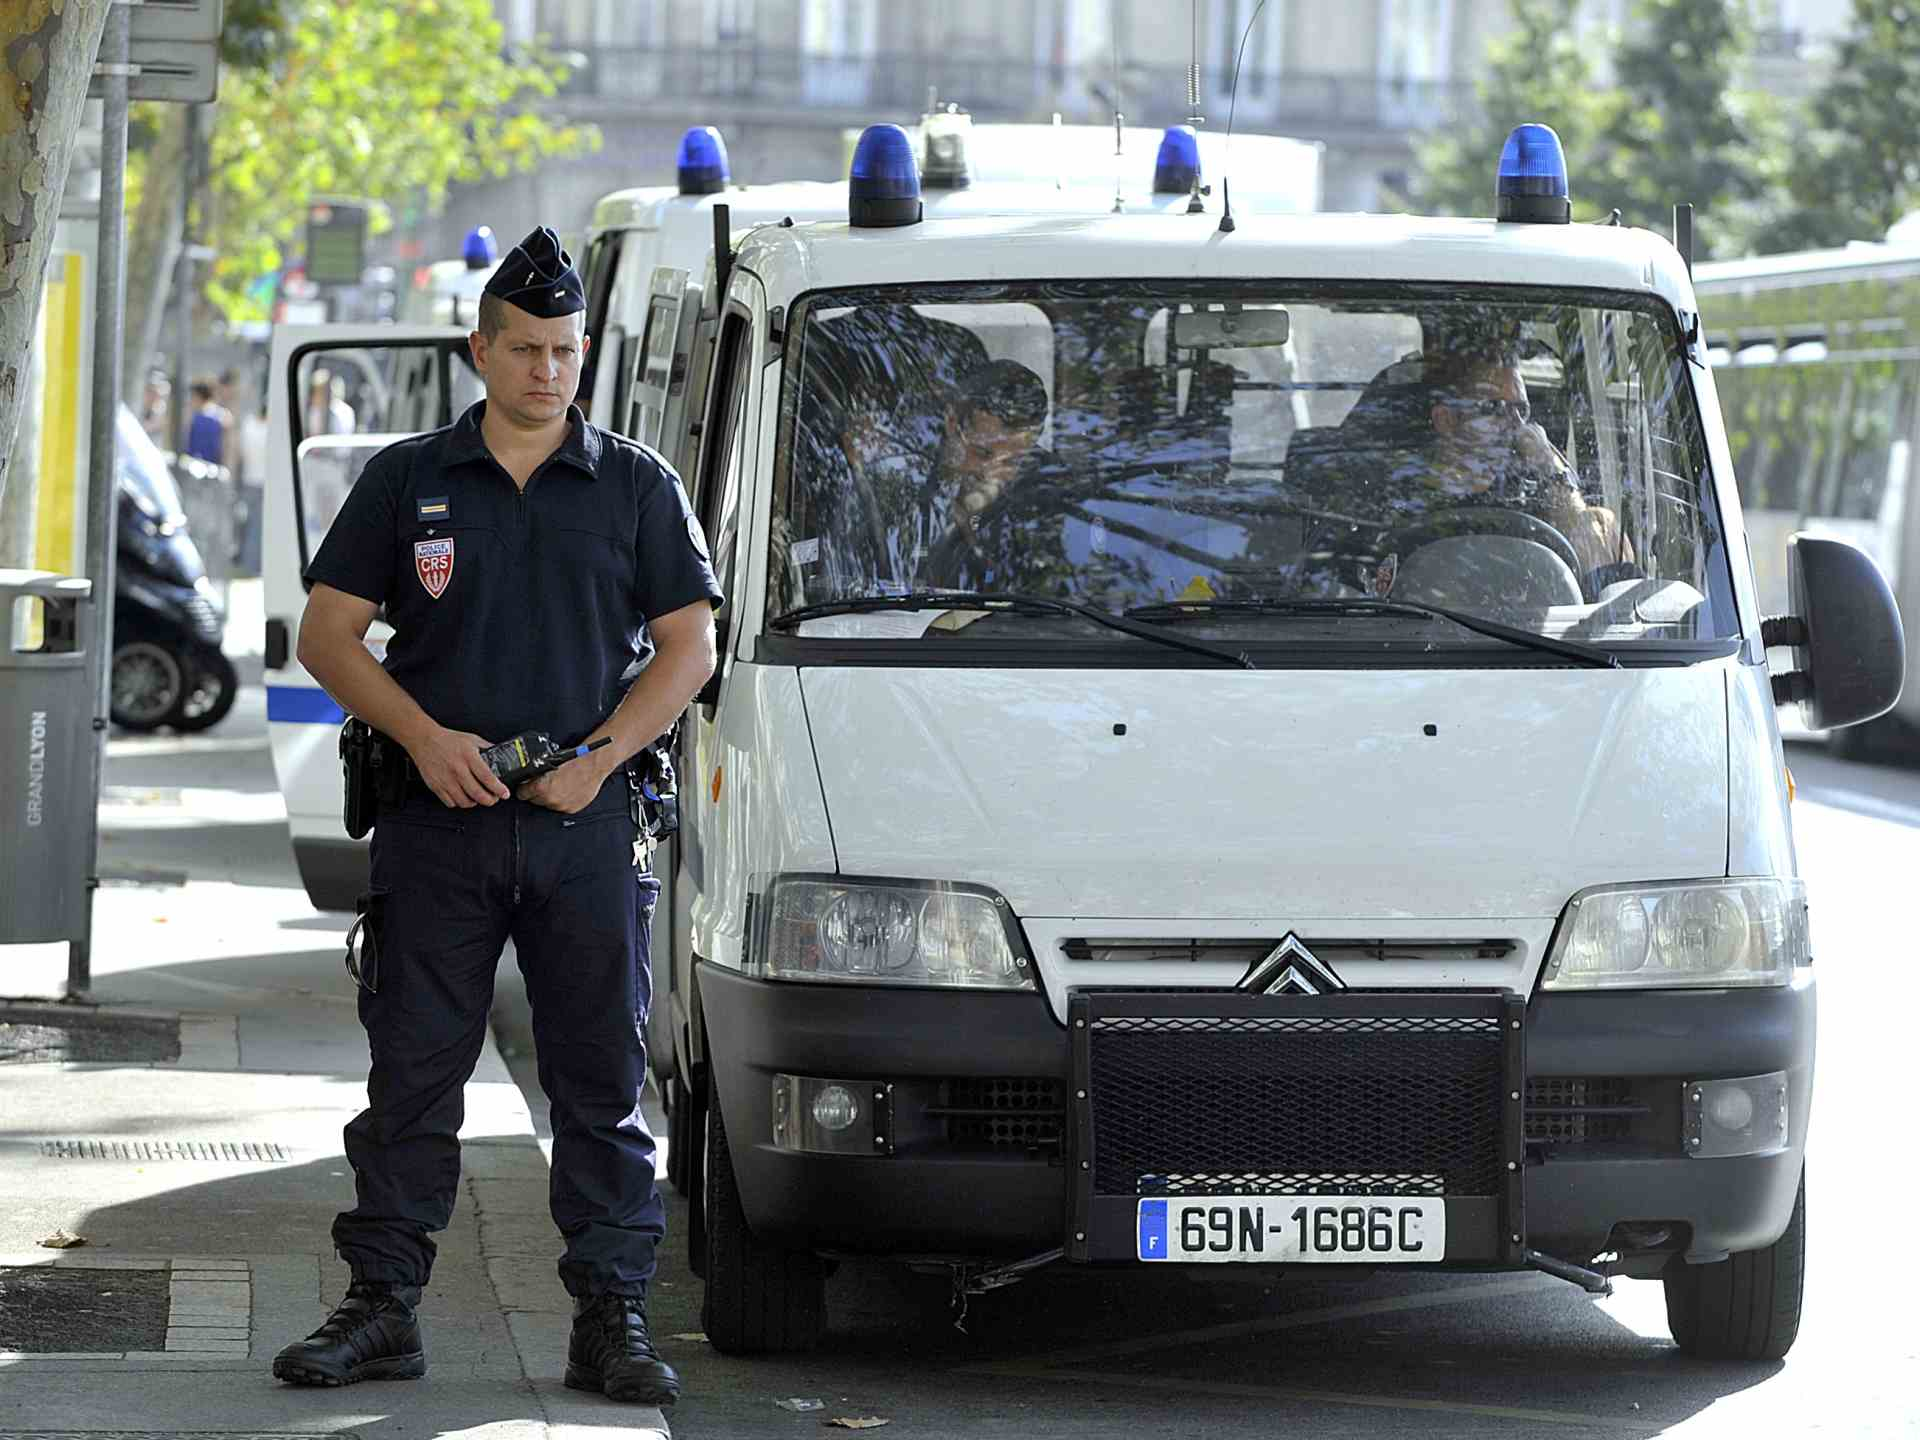 FRANCUSKA POLICIJA: Identificiran organizator napada u Parizu i Bruxellesu